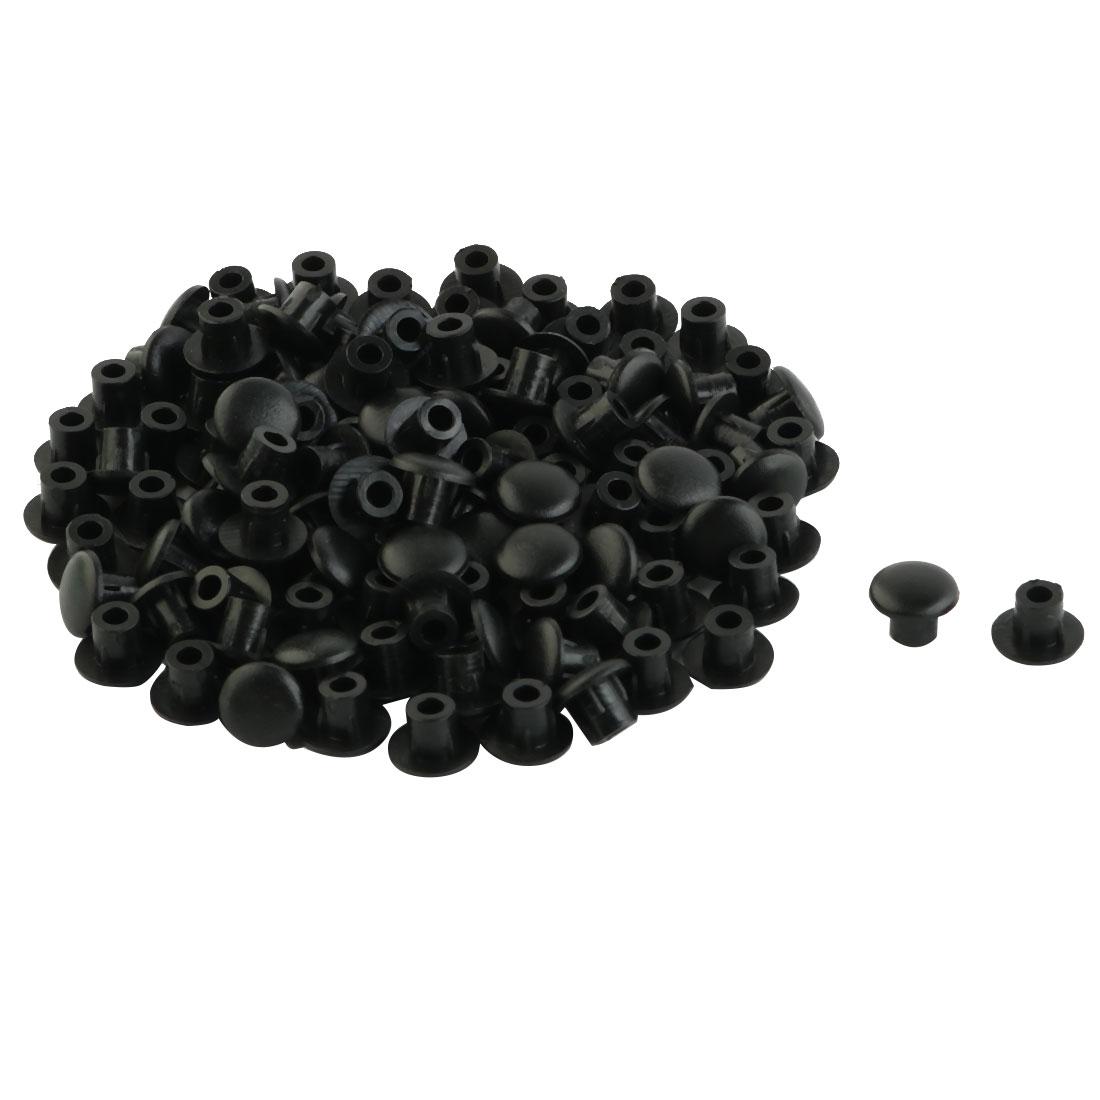 Home Furniture Decor 5mm Black Plastic Hole Drilling Cover Plugs 100pcs